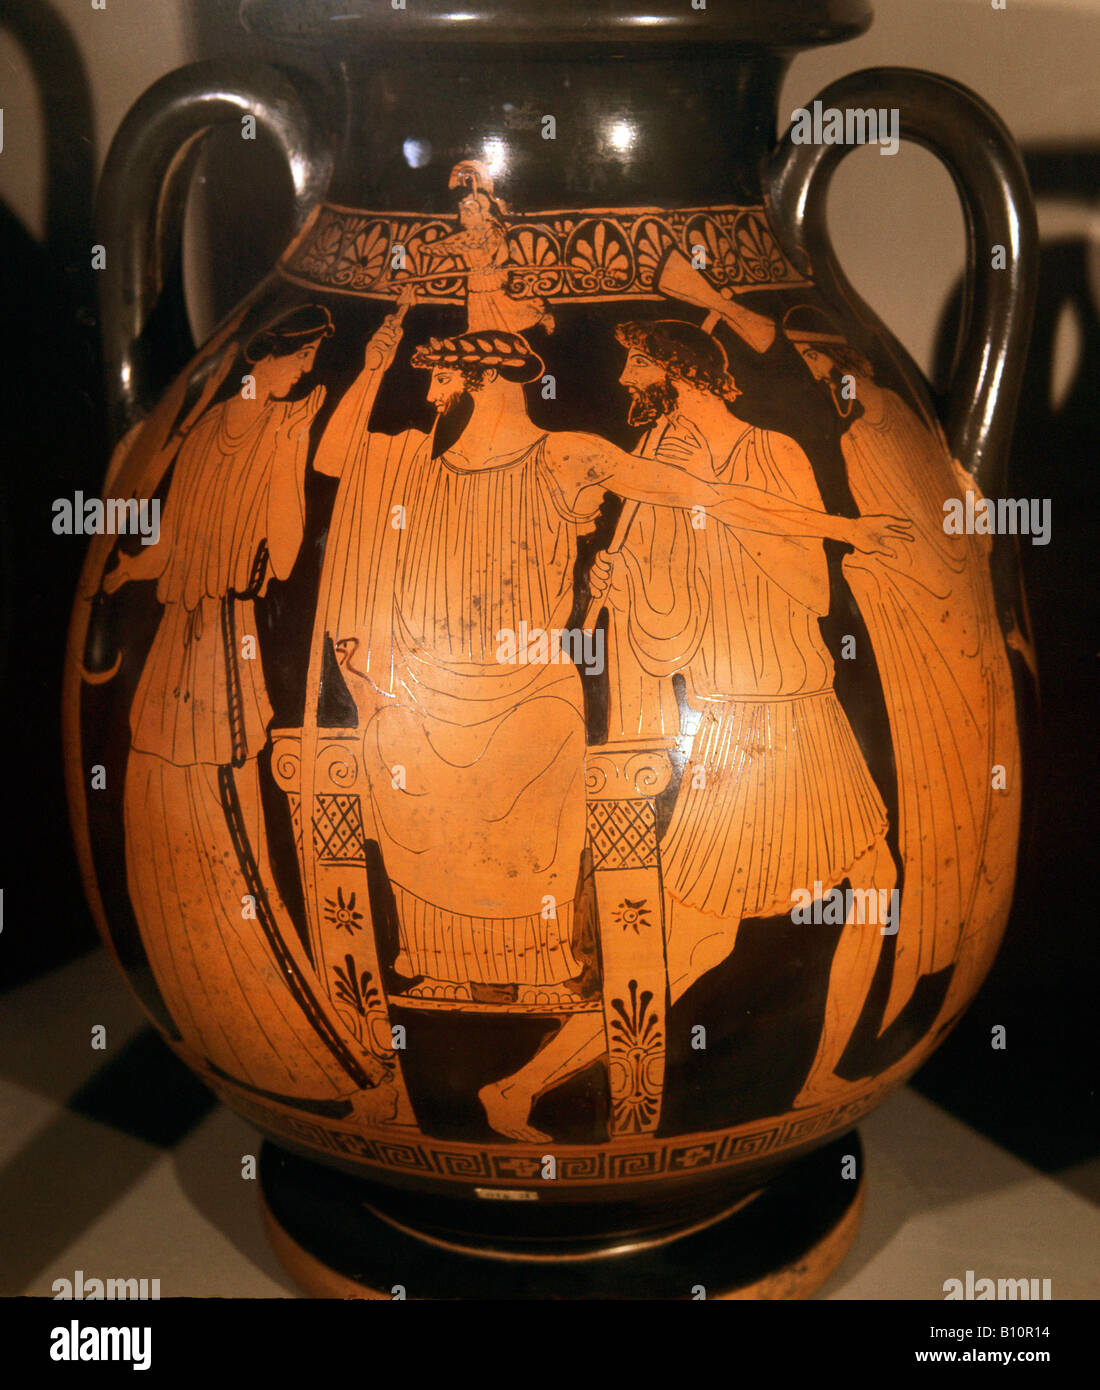 Greek vase painting stock photos greek vase painting stock greek vase painting hephaestos stands behind zeus birth of athena stock image reviewsmspy